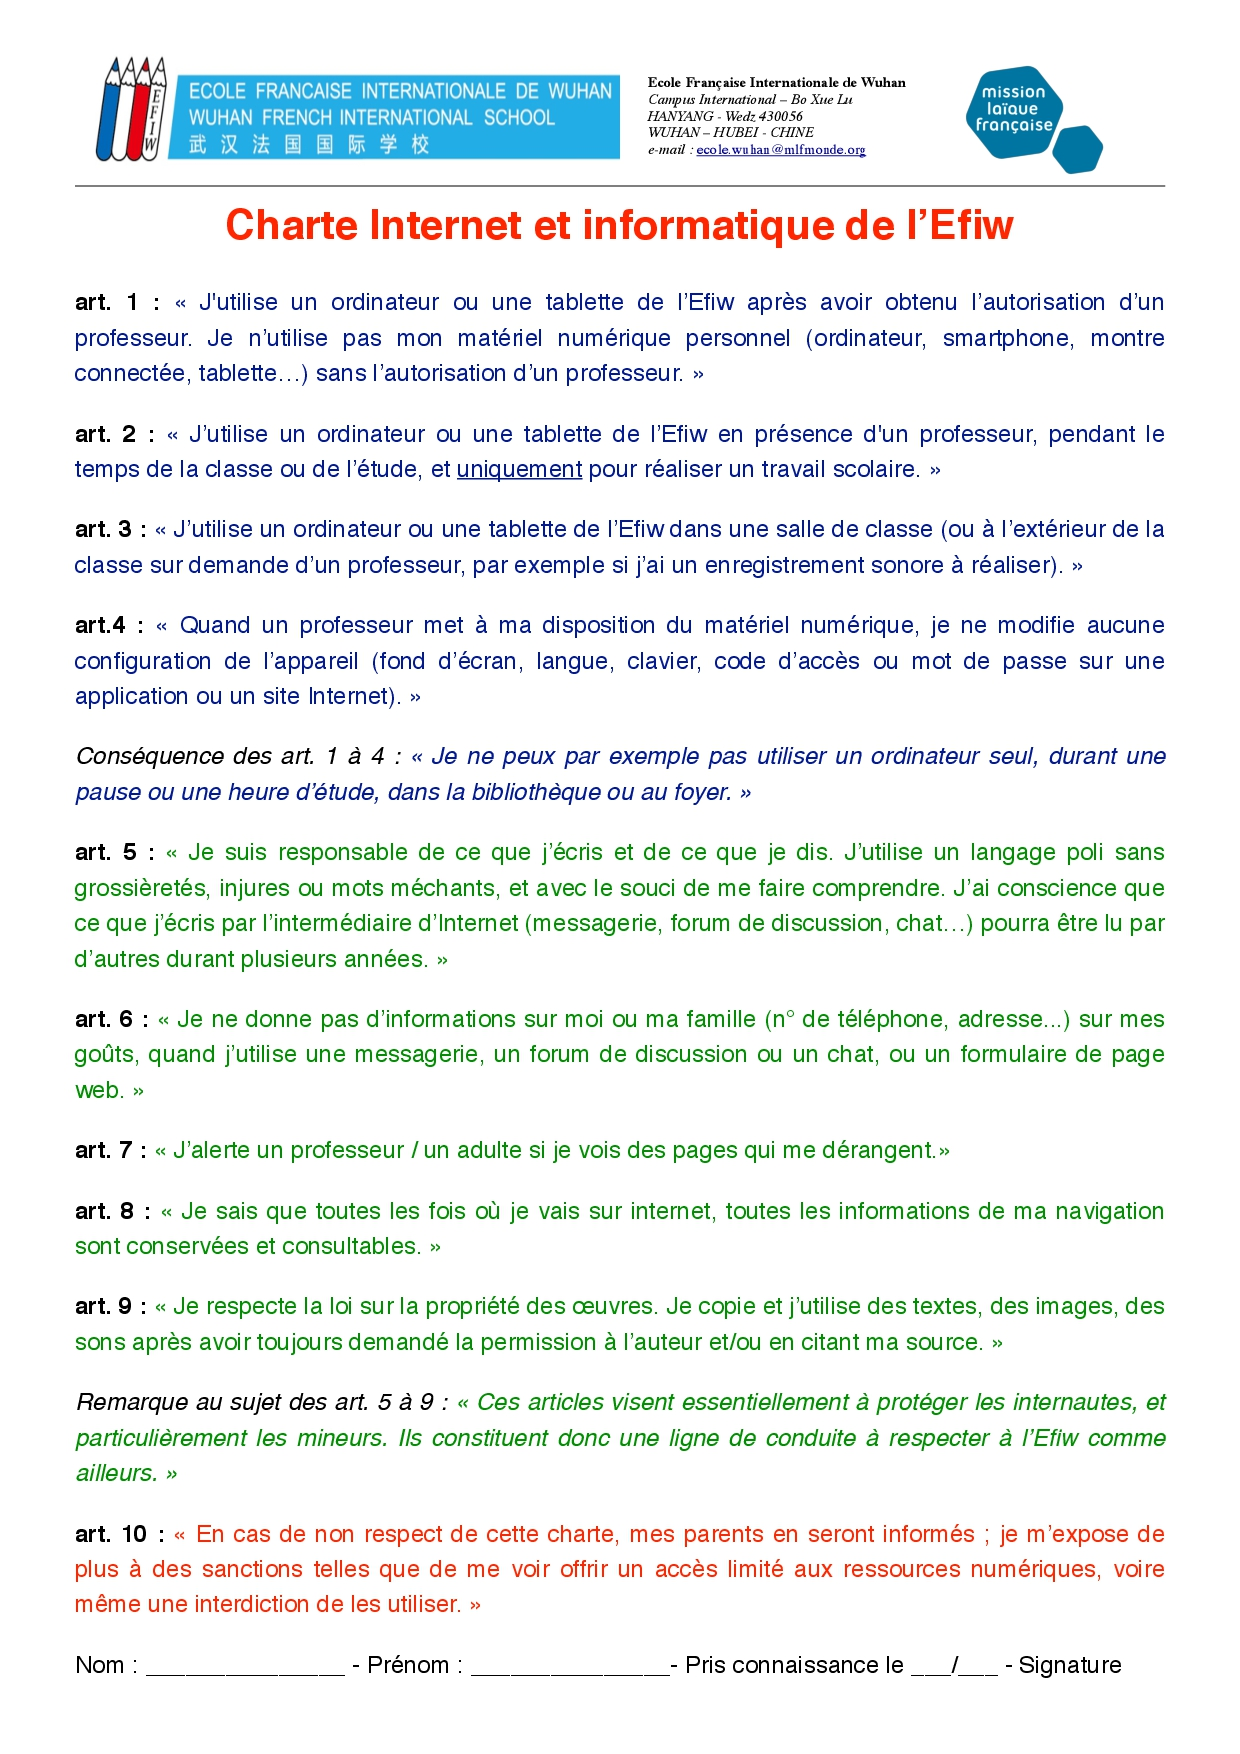 Charte informatique FR